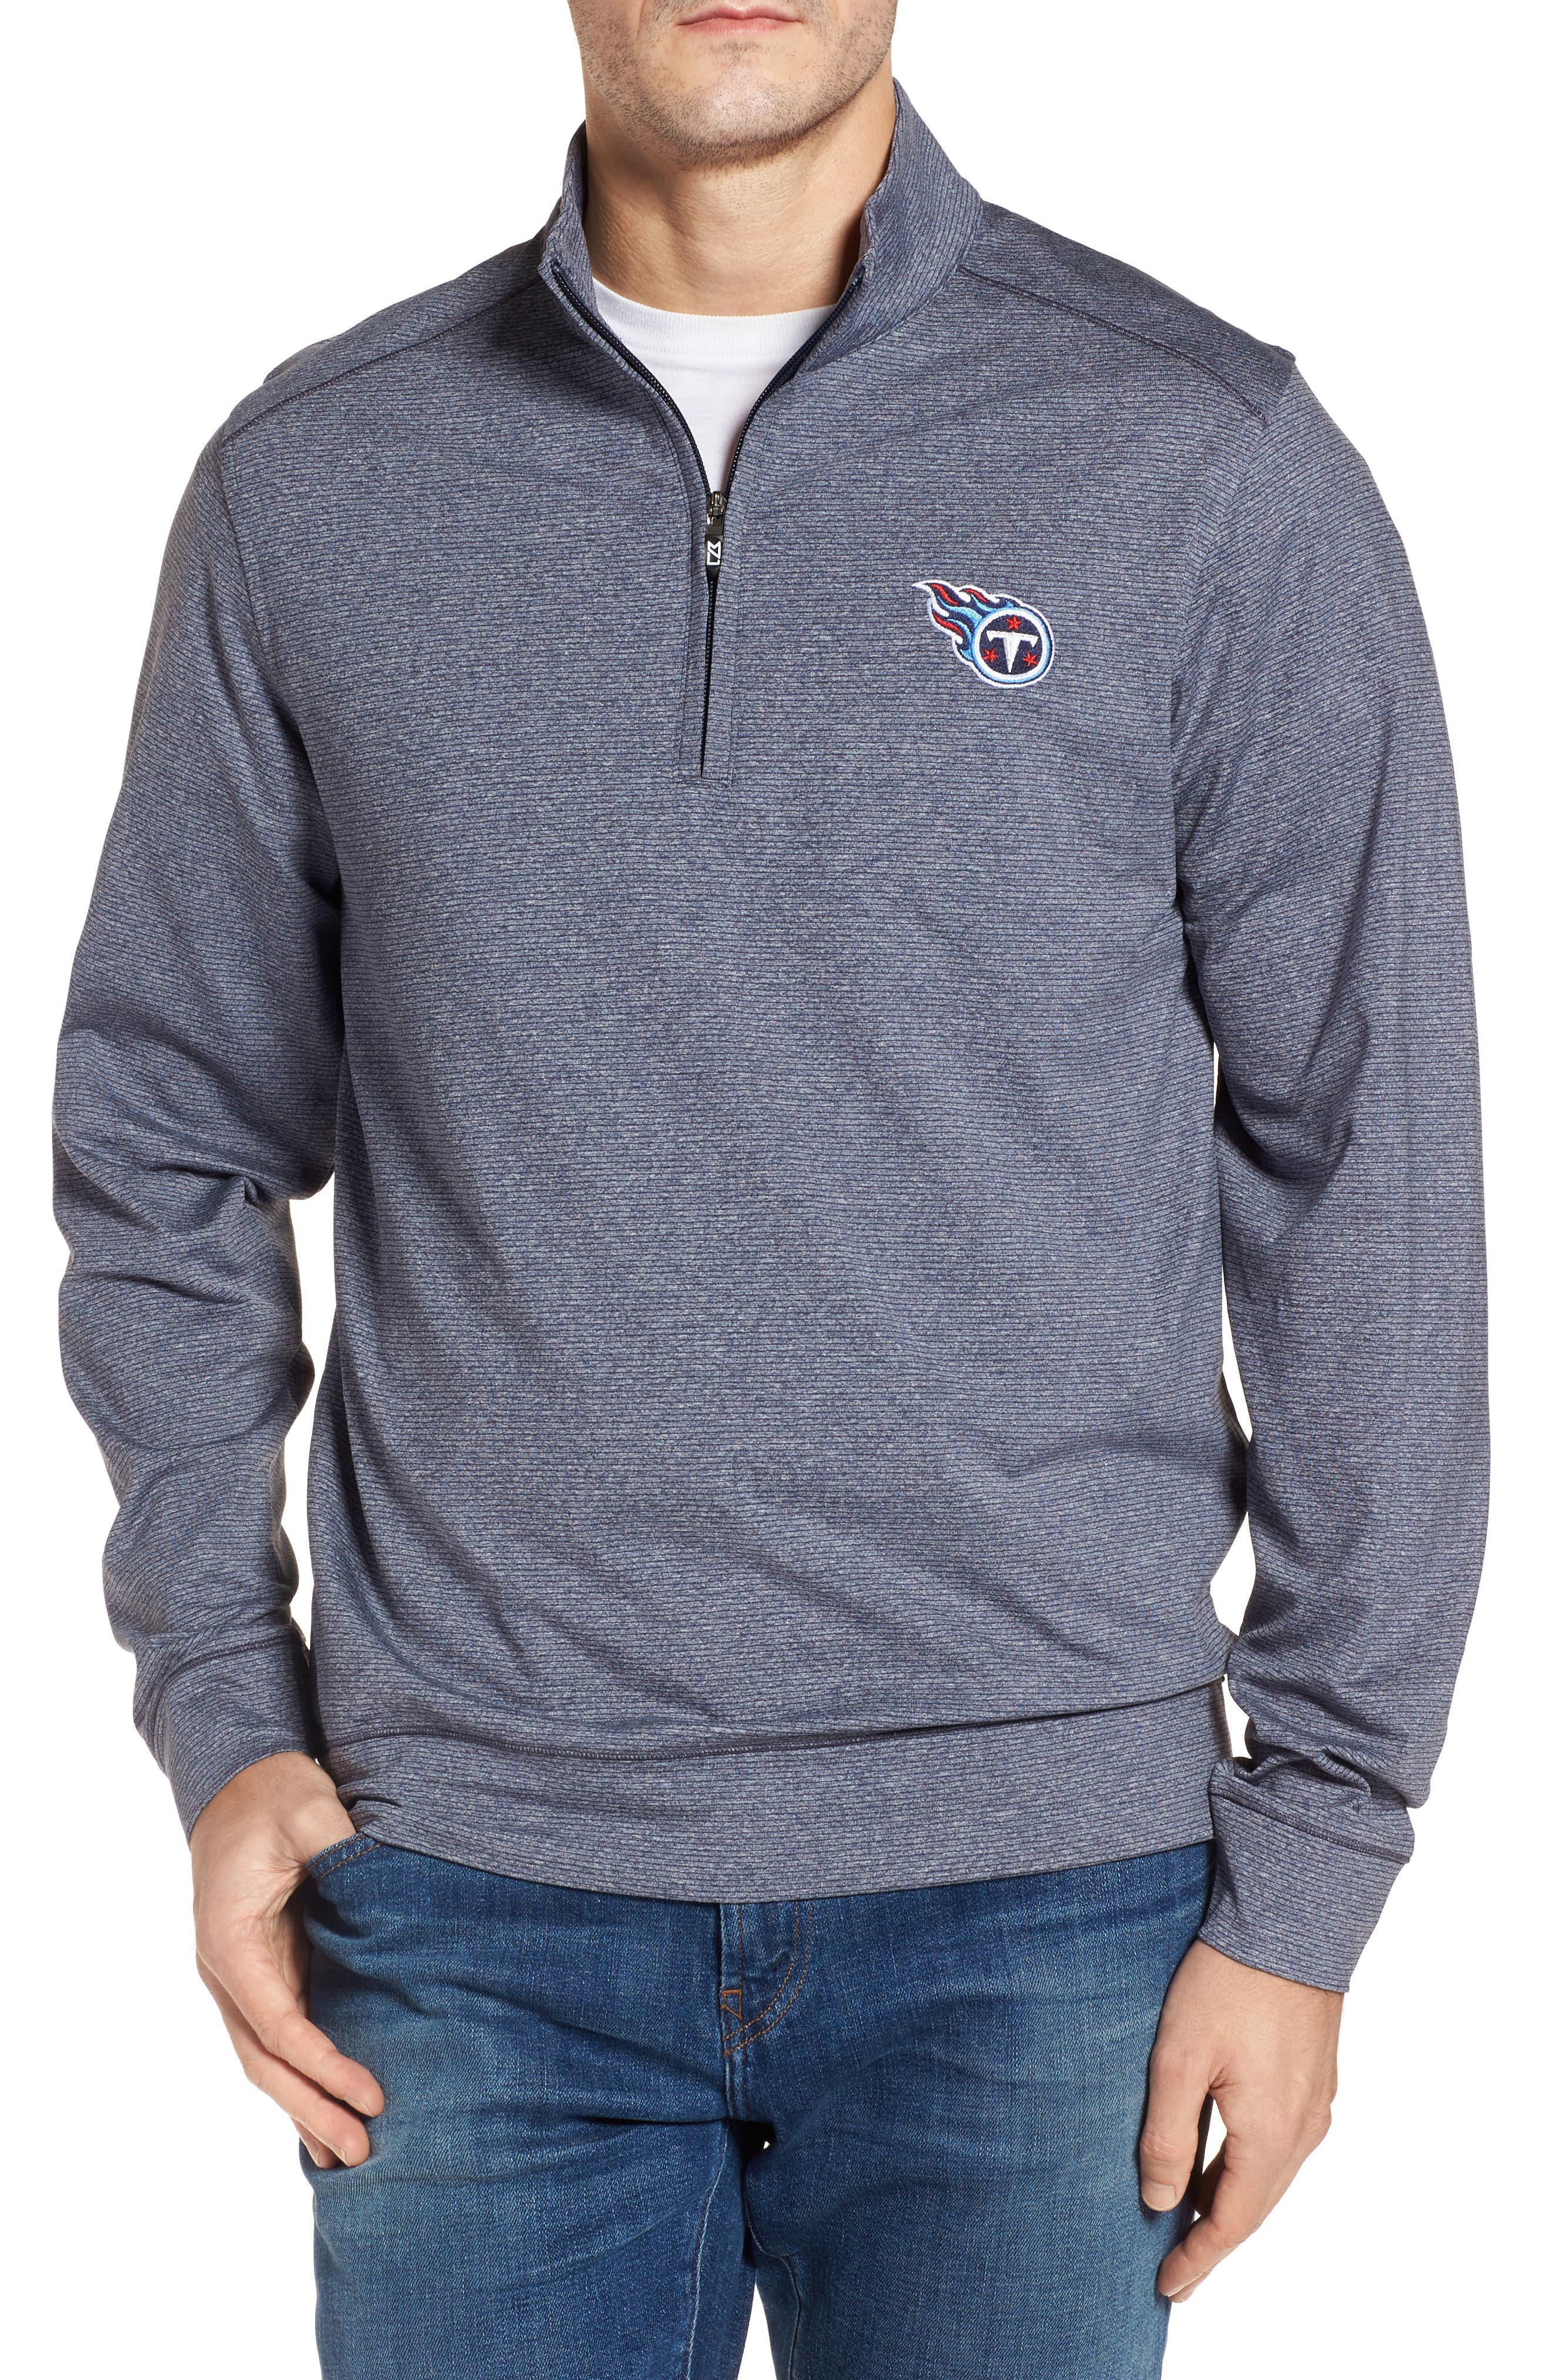 Shoreline - Tennessee Titans Half Zip Pullover,                         Main,                         color, Liberty Navy Heather